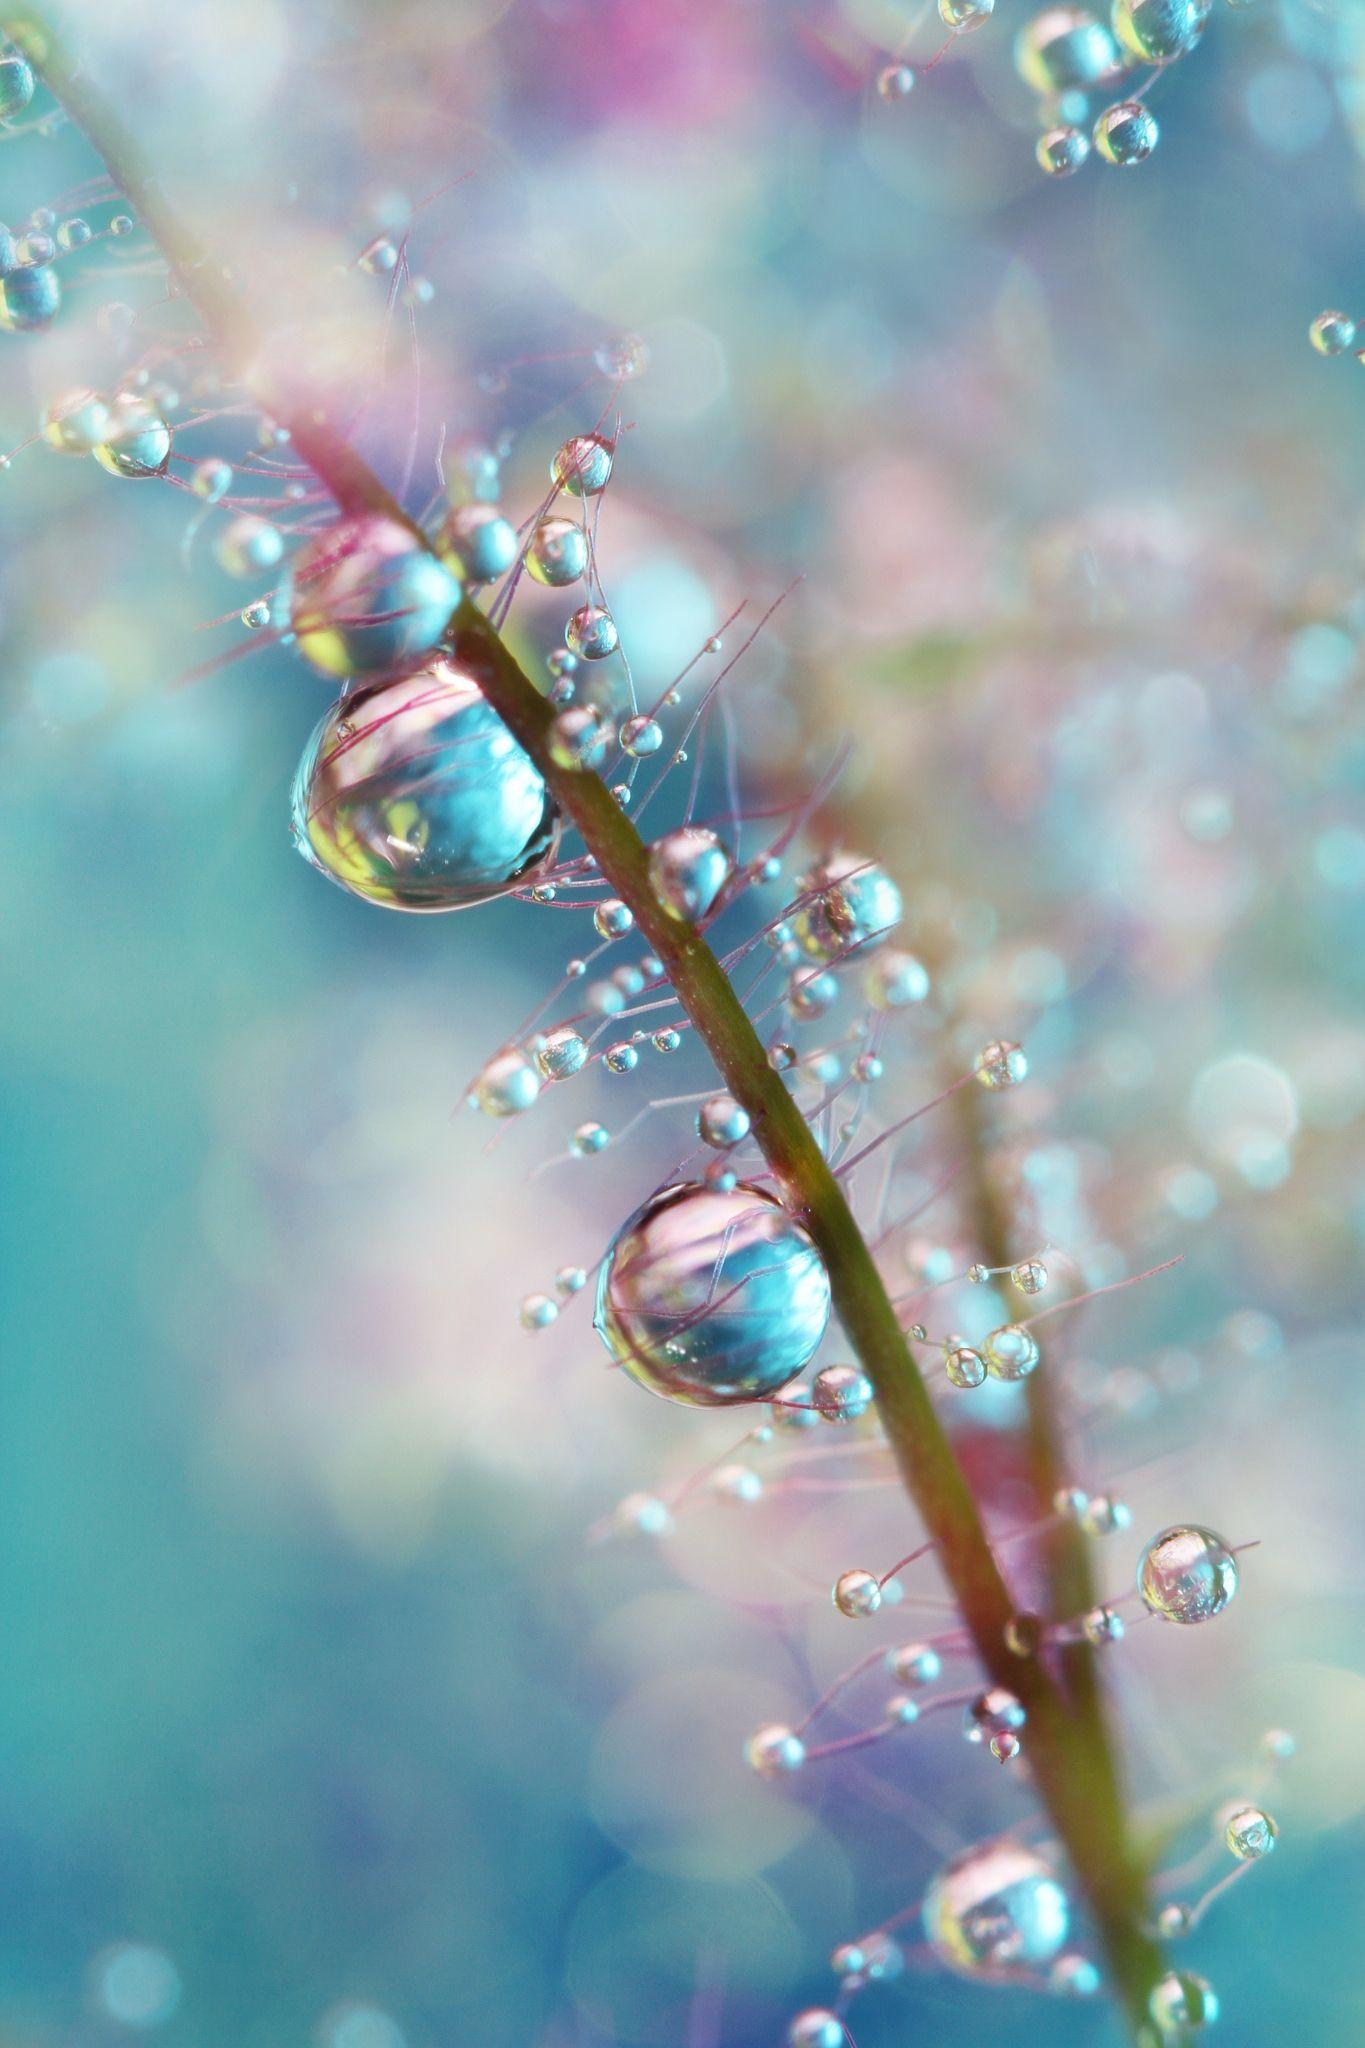 Rainbow Blue Smokey Drops by Sharon Johnstone - Water droplets on the 'Smoke Bush'